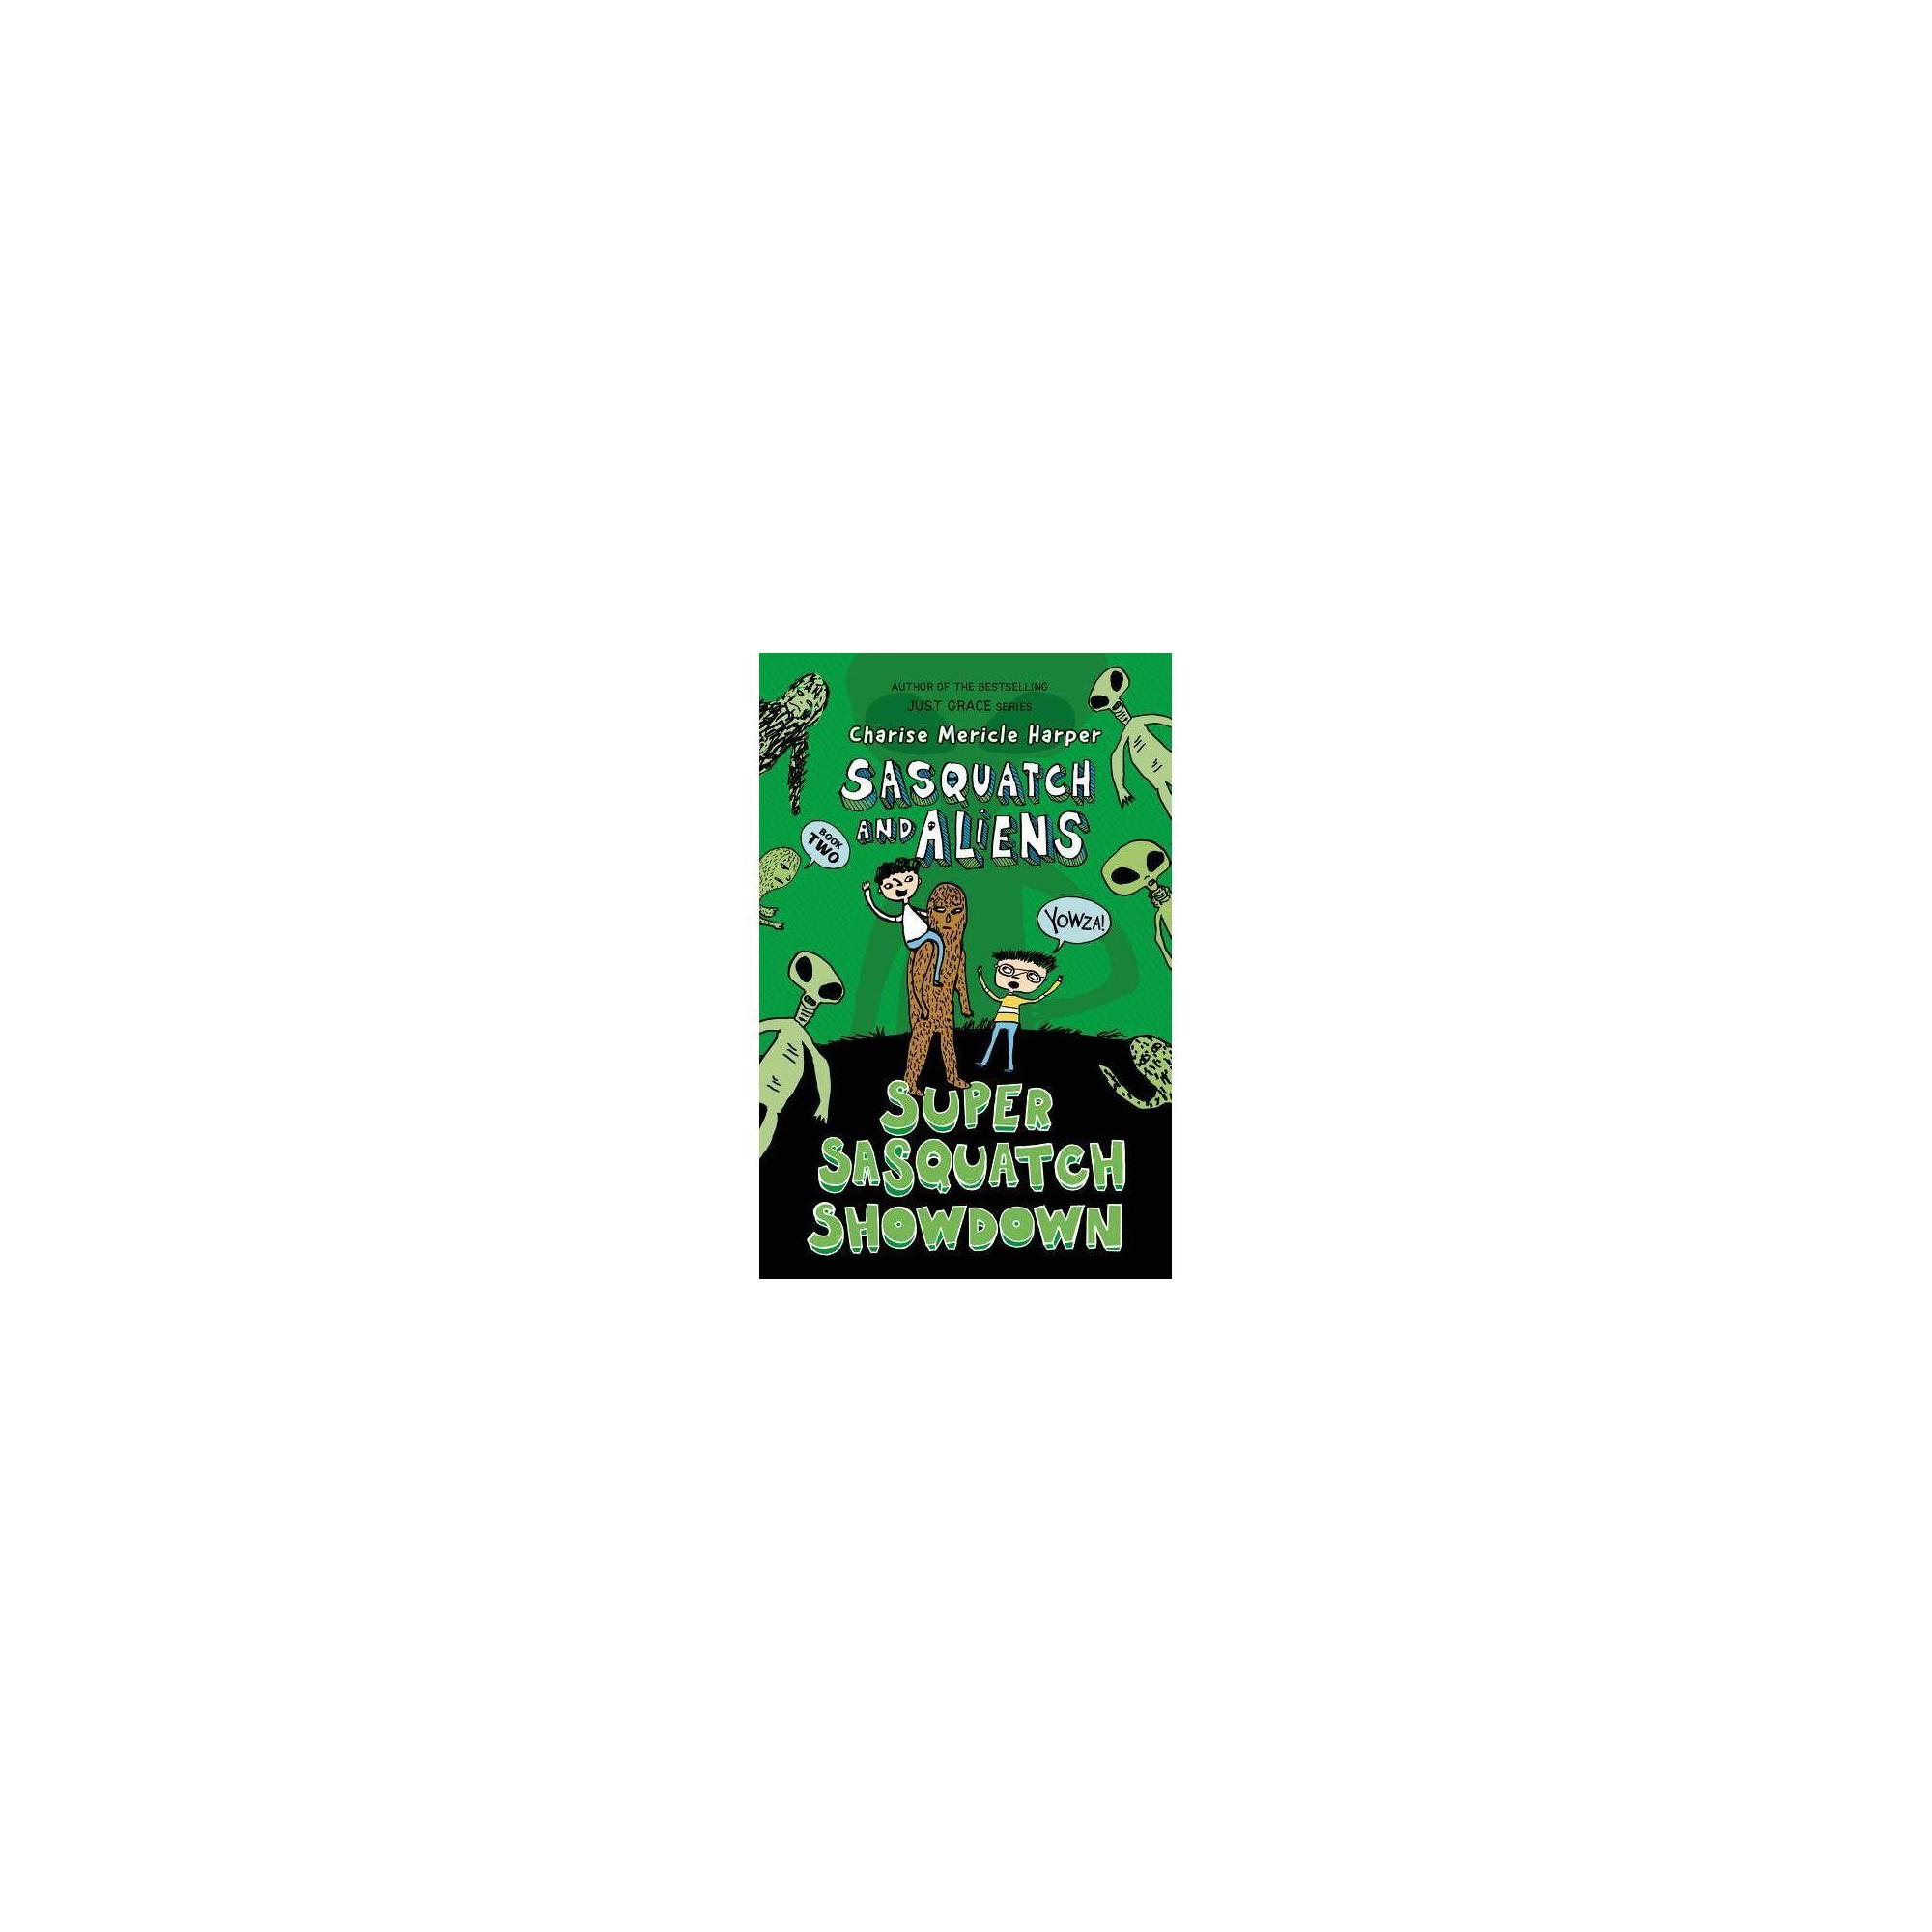 Super Sasquatch Showdown - (Sasquatch and Aliens) by Charise Mericle Harper (Hardcover)